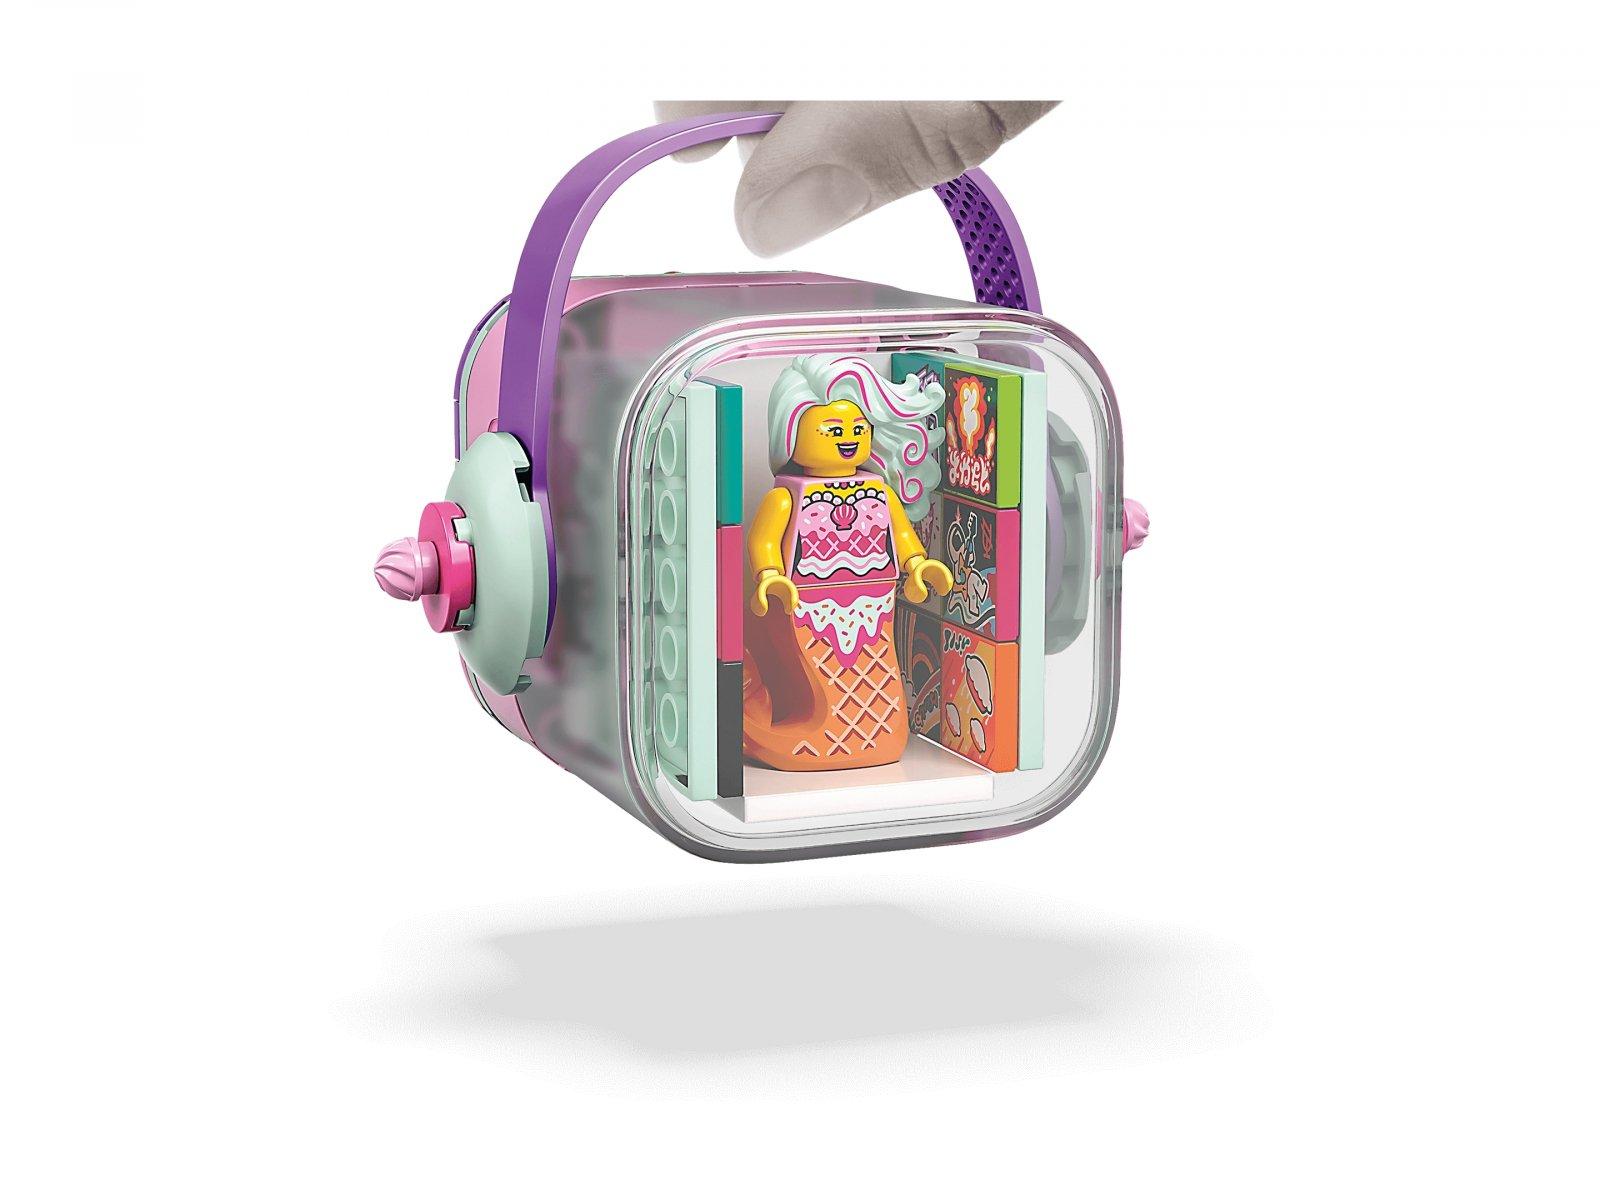 LEGO 43102 VIDIYO Candy Mermaid BeatBox